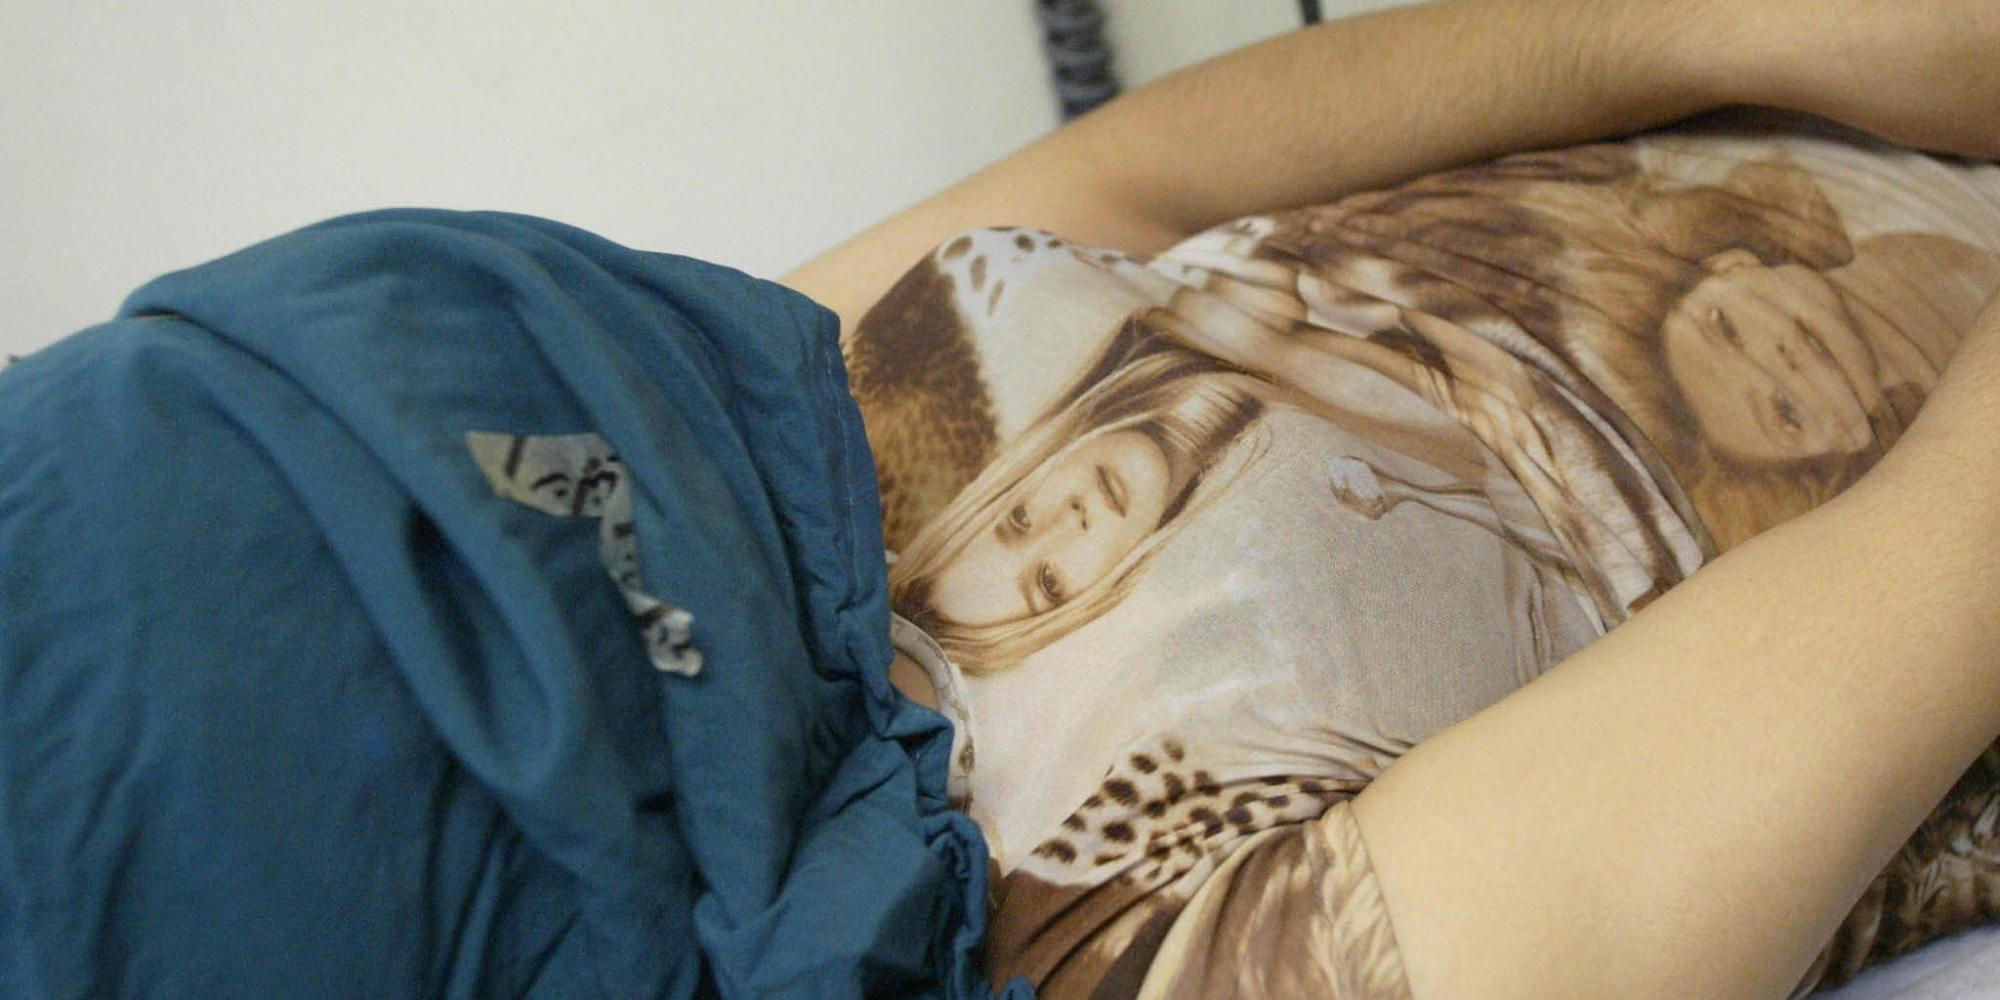 Freckle faced women sex tube videos